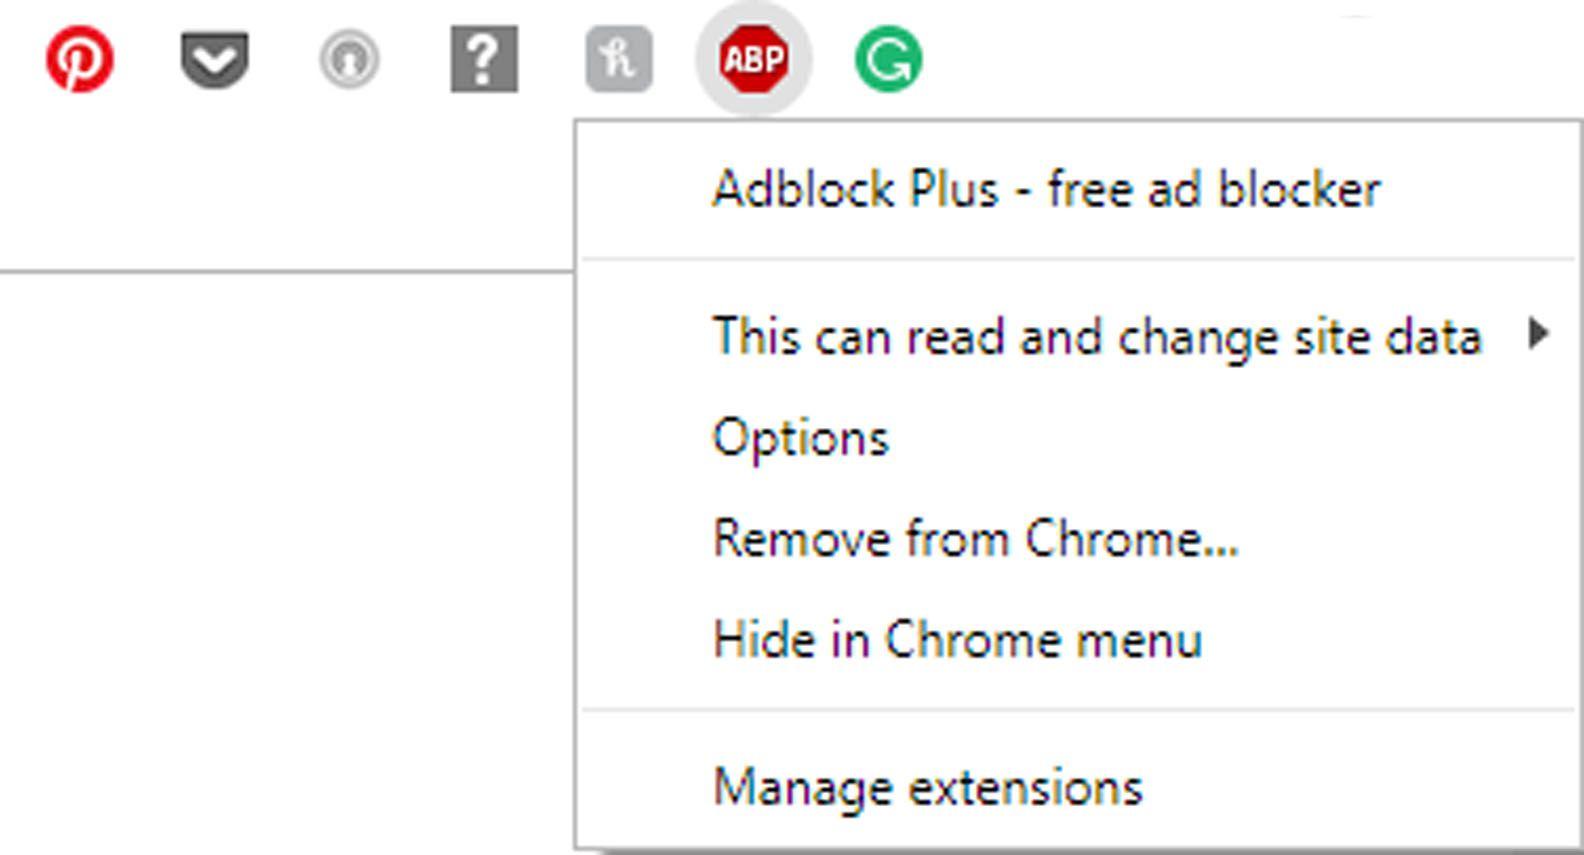 Menu for Chrome extensions